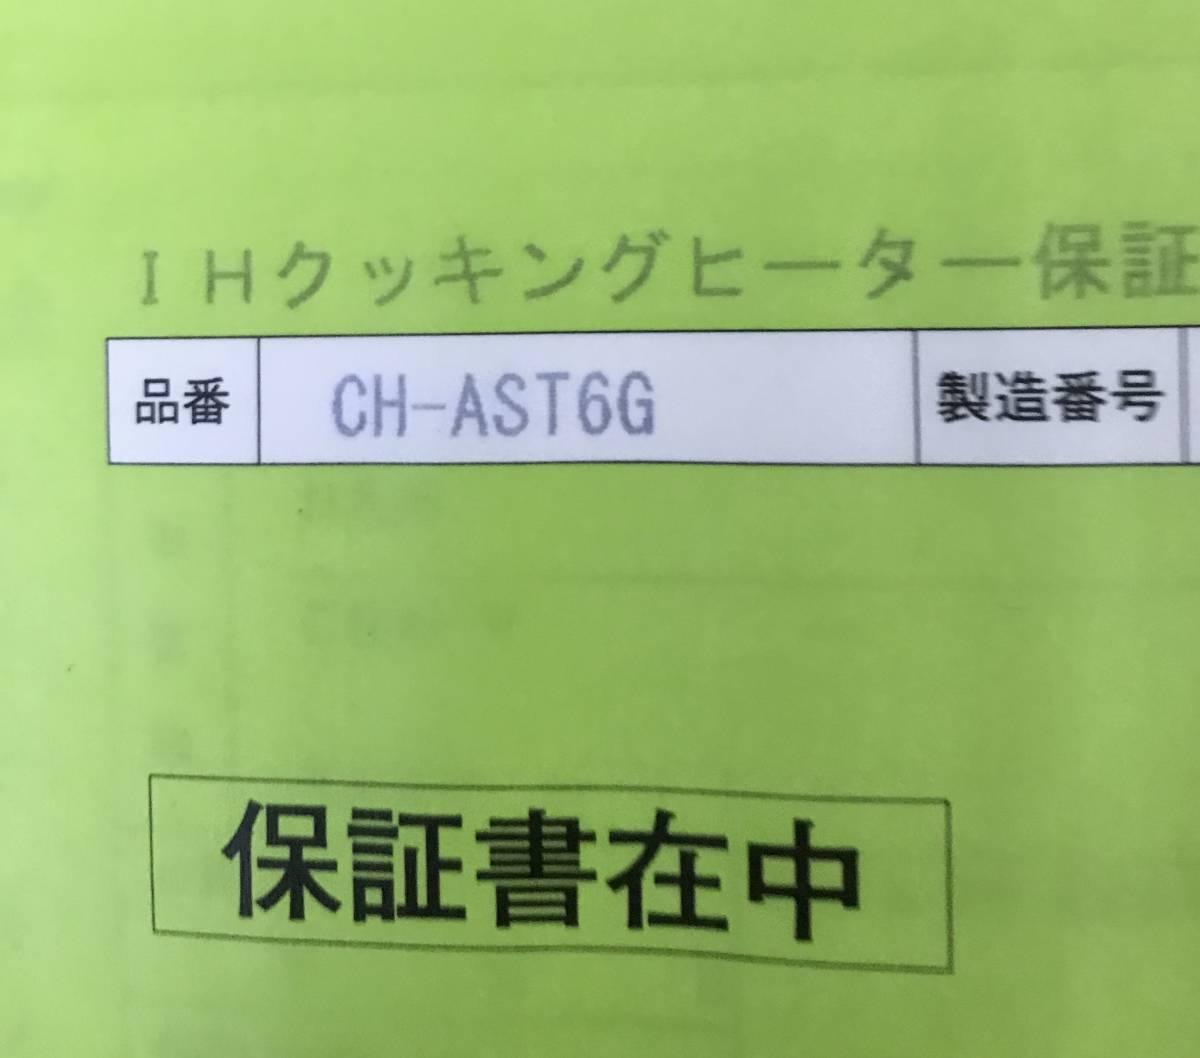 Panasonic パナソニック ビルトイン IH CH-AS6G JG 2口IH+ラジエント LIXIL リクシル コンロ 未使用品 格安 激安 最安値 1円_画像3